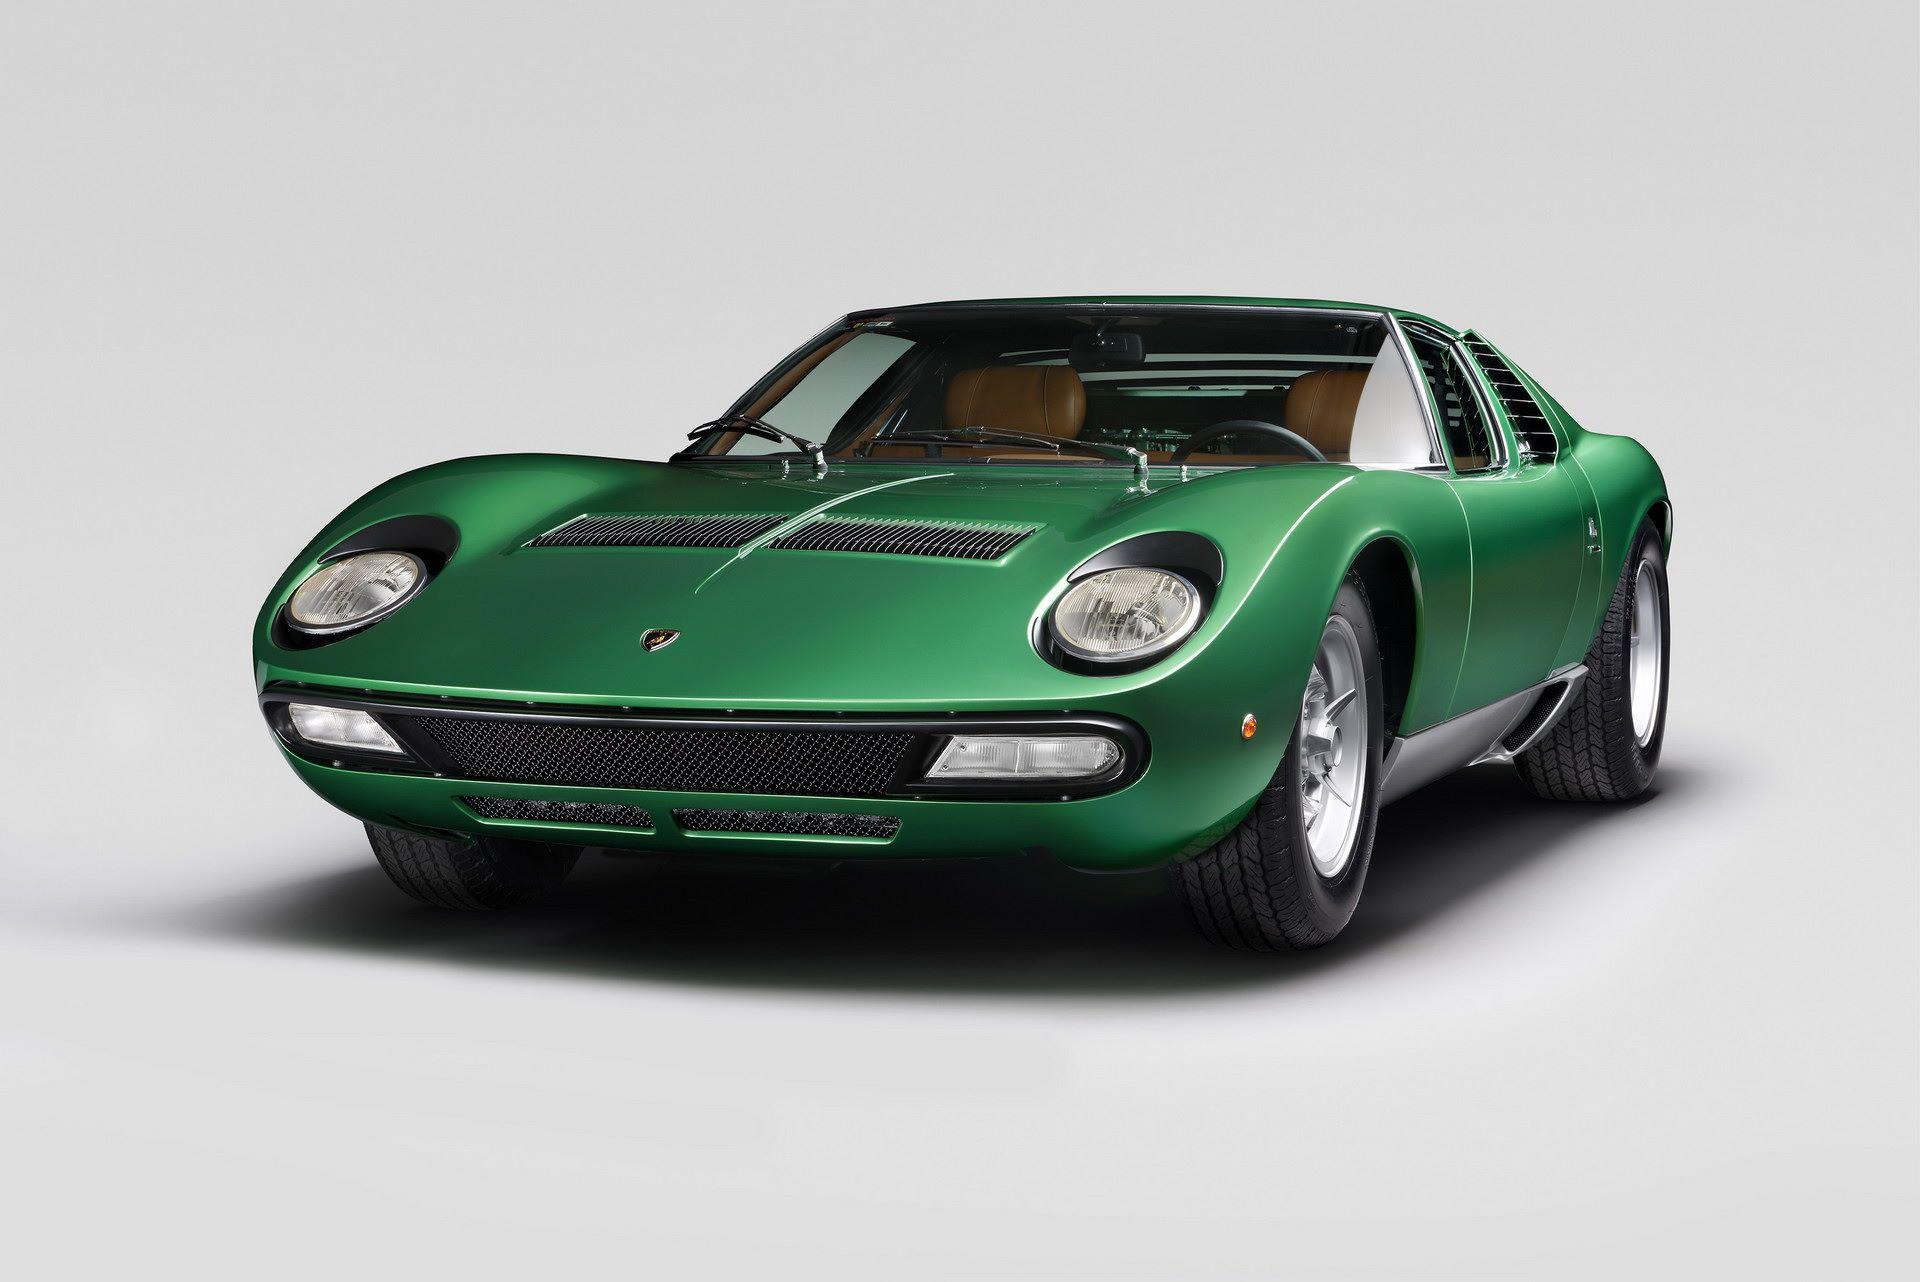 Lamborghini-Miura-SV-turns-50-9